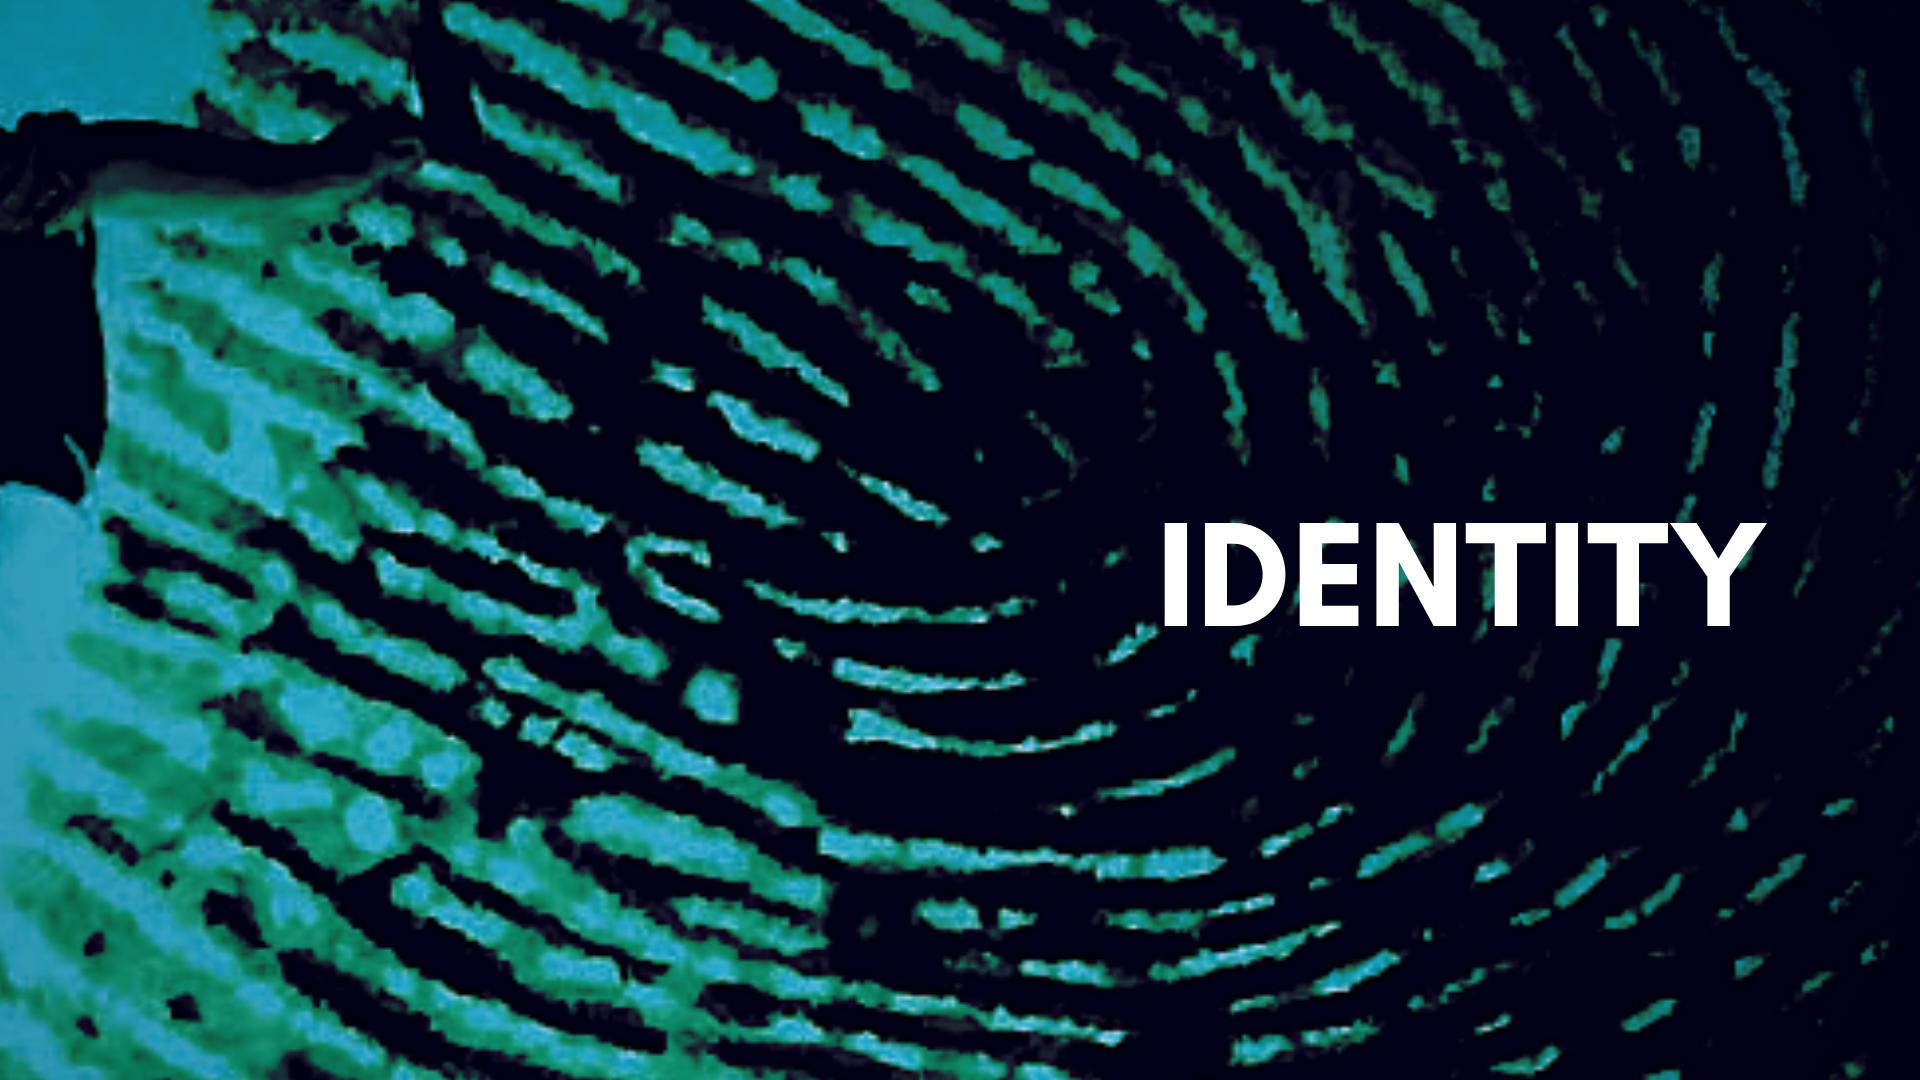 identity title slide.png